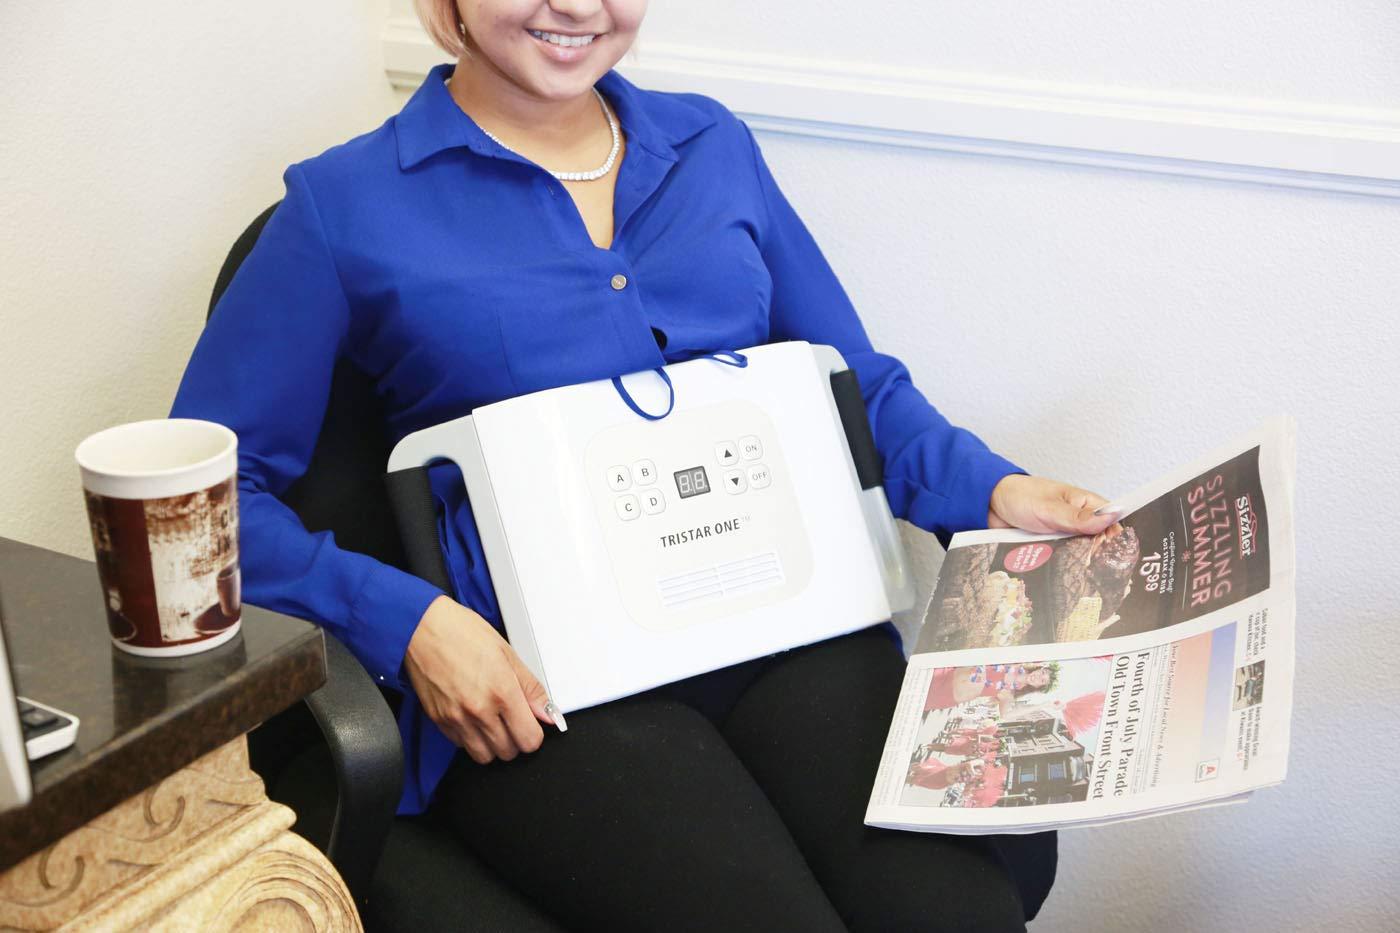 DIA Protable 620nm Liposuction Lipolaser Lipo Laser Body Slimming Beauty Machine by Dia Beauty